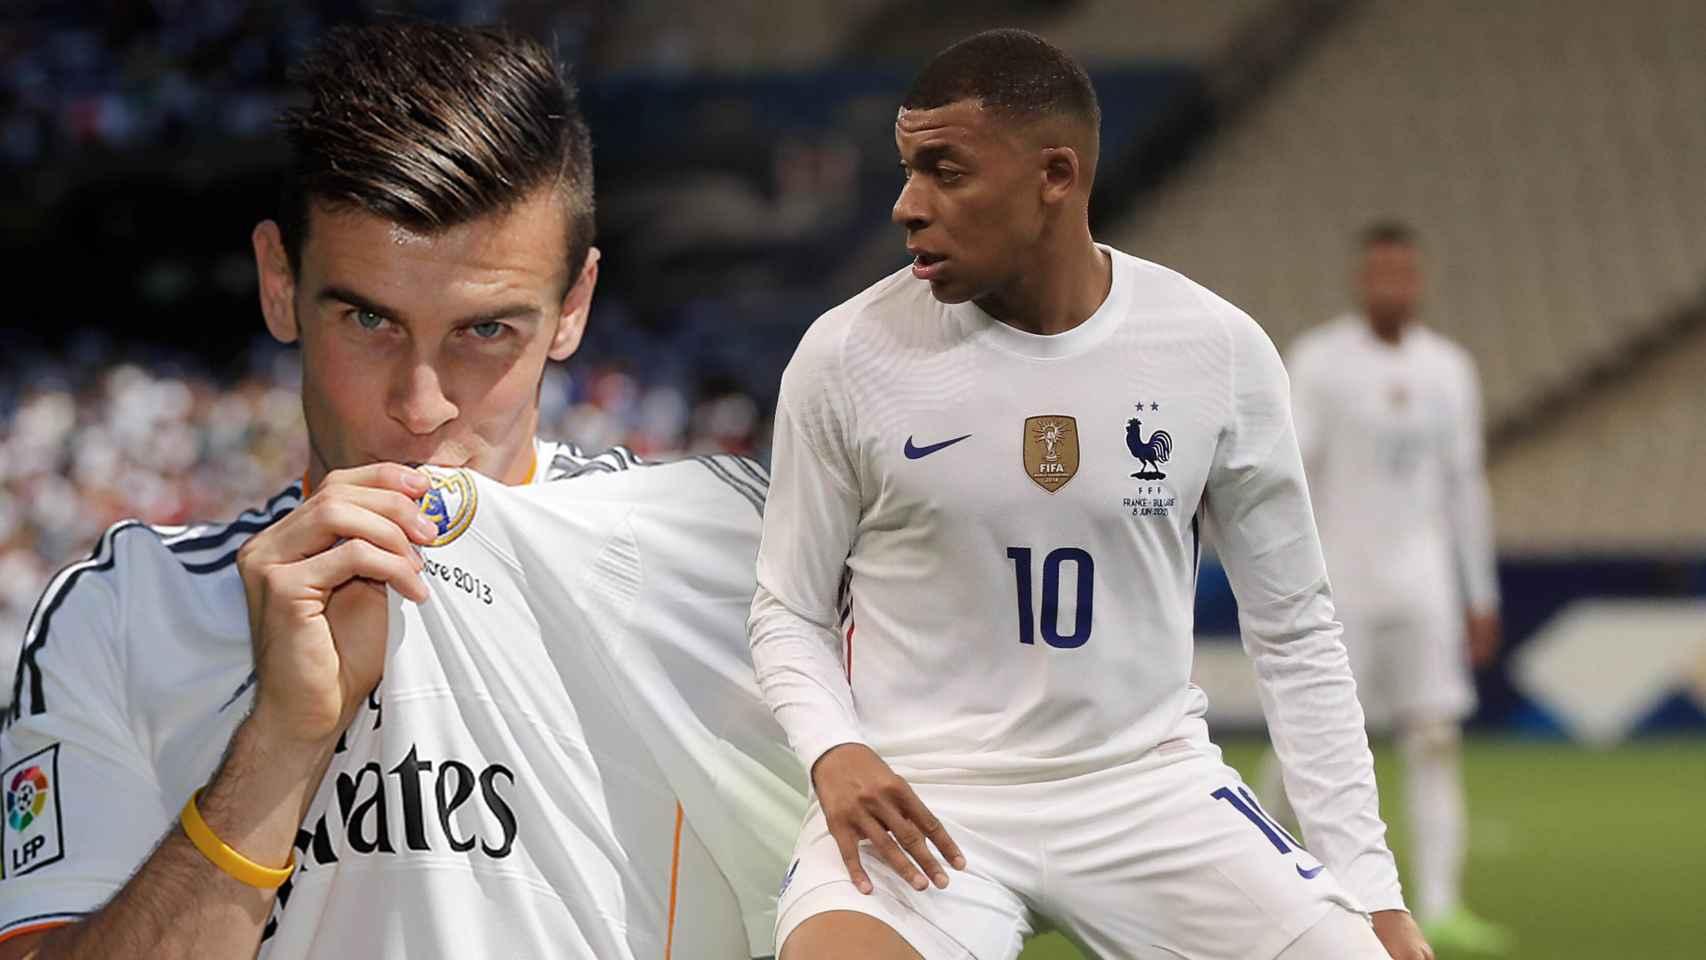 Mbappé y las similitudes con el fichaje de Bale